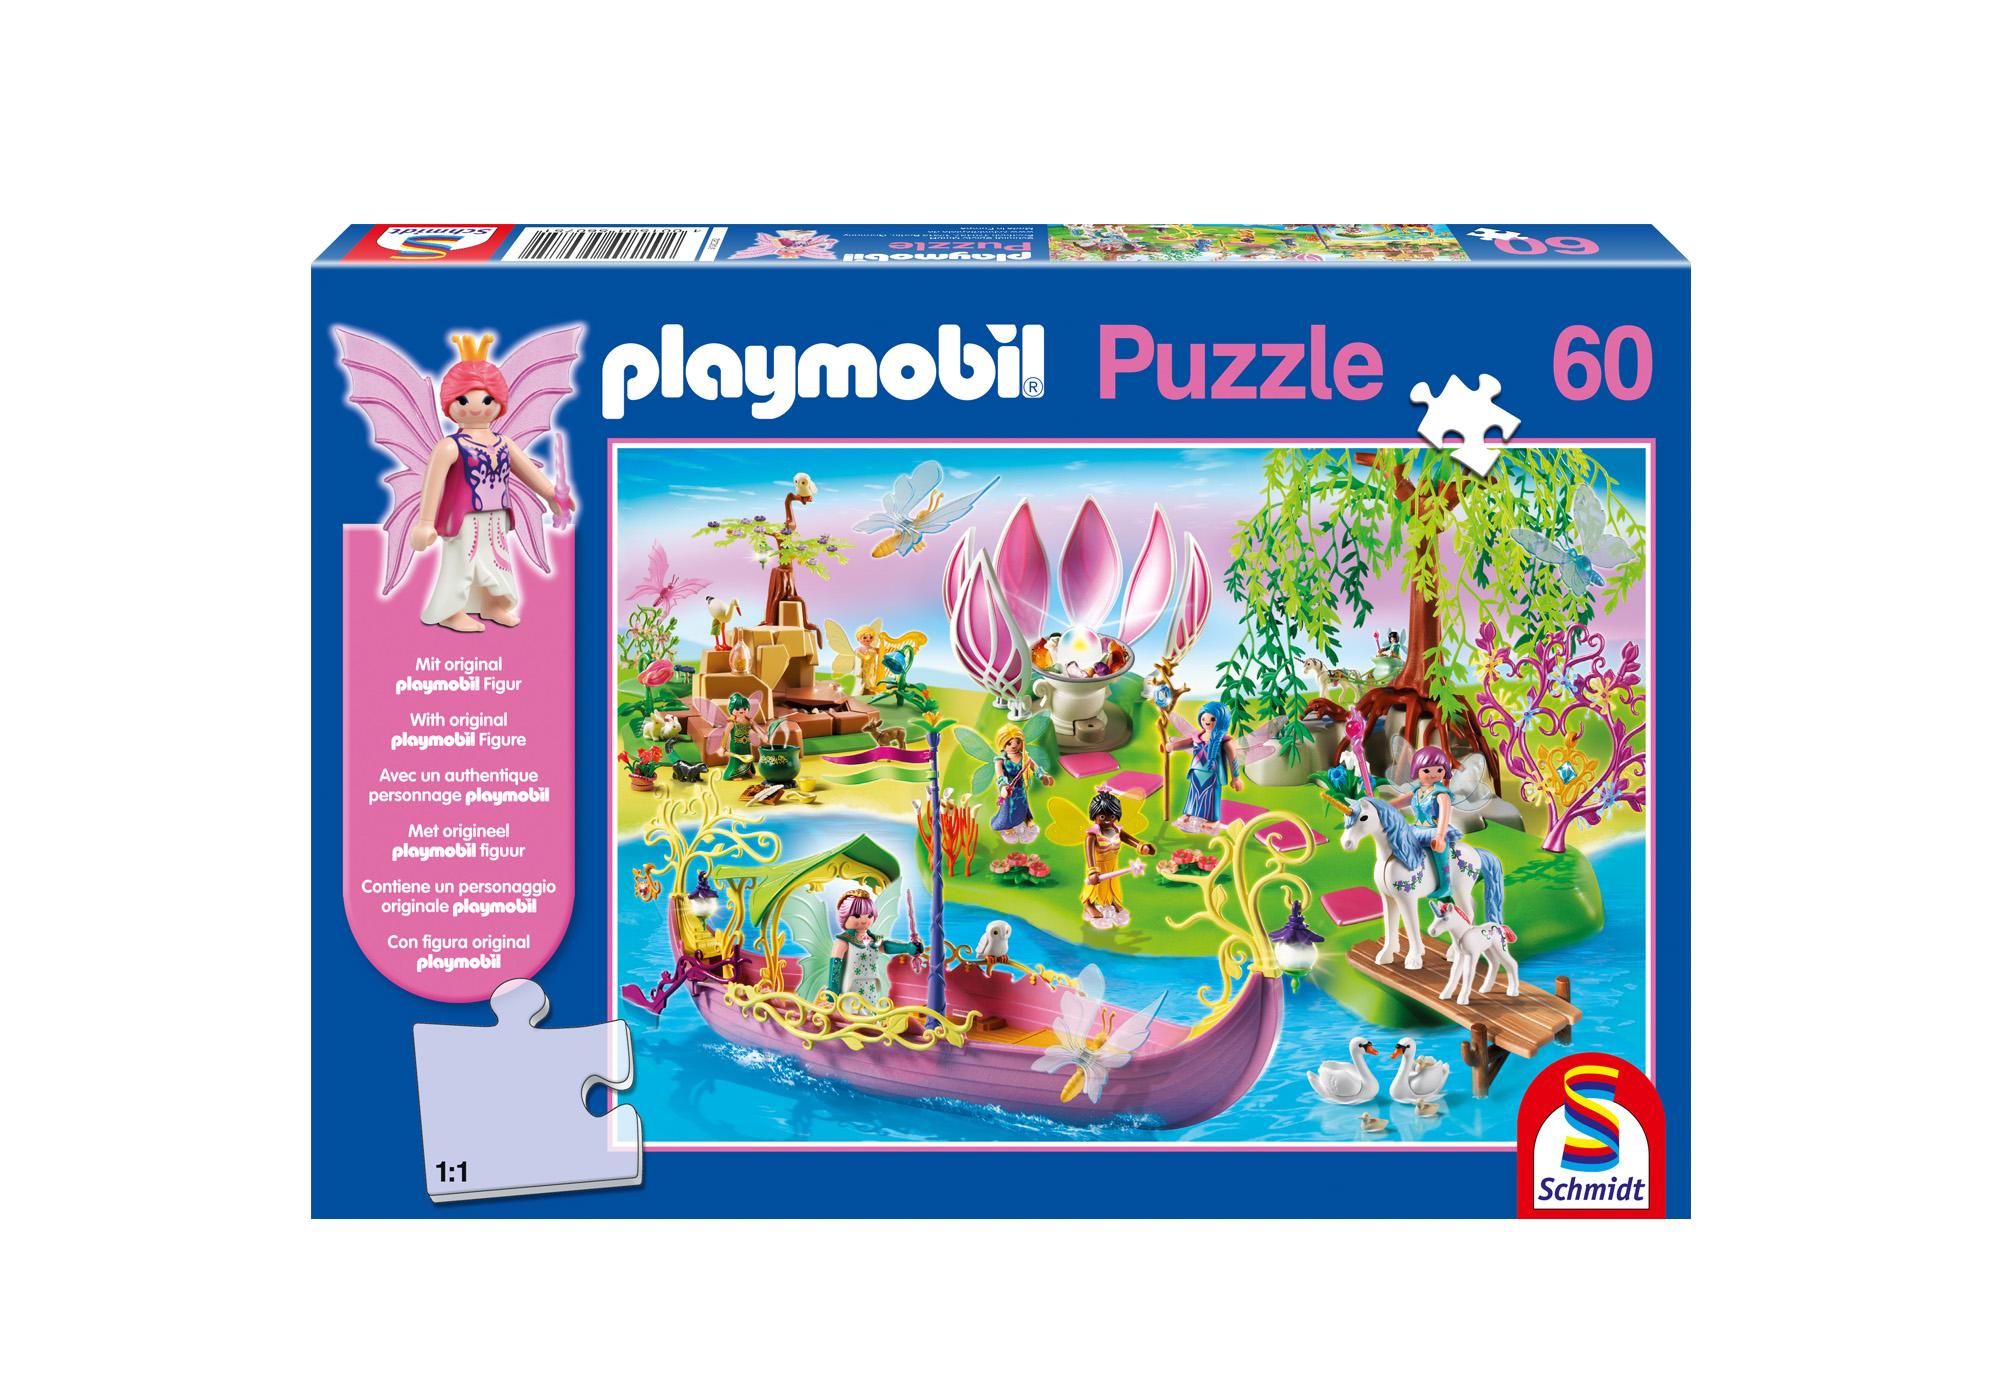 http://media.playmobil.com/i/playmobil/80373_product_detail